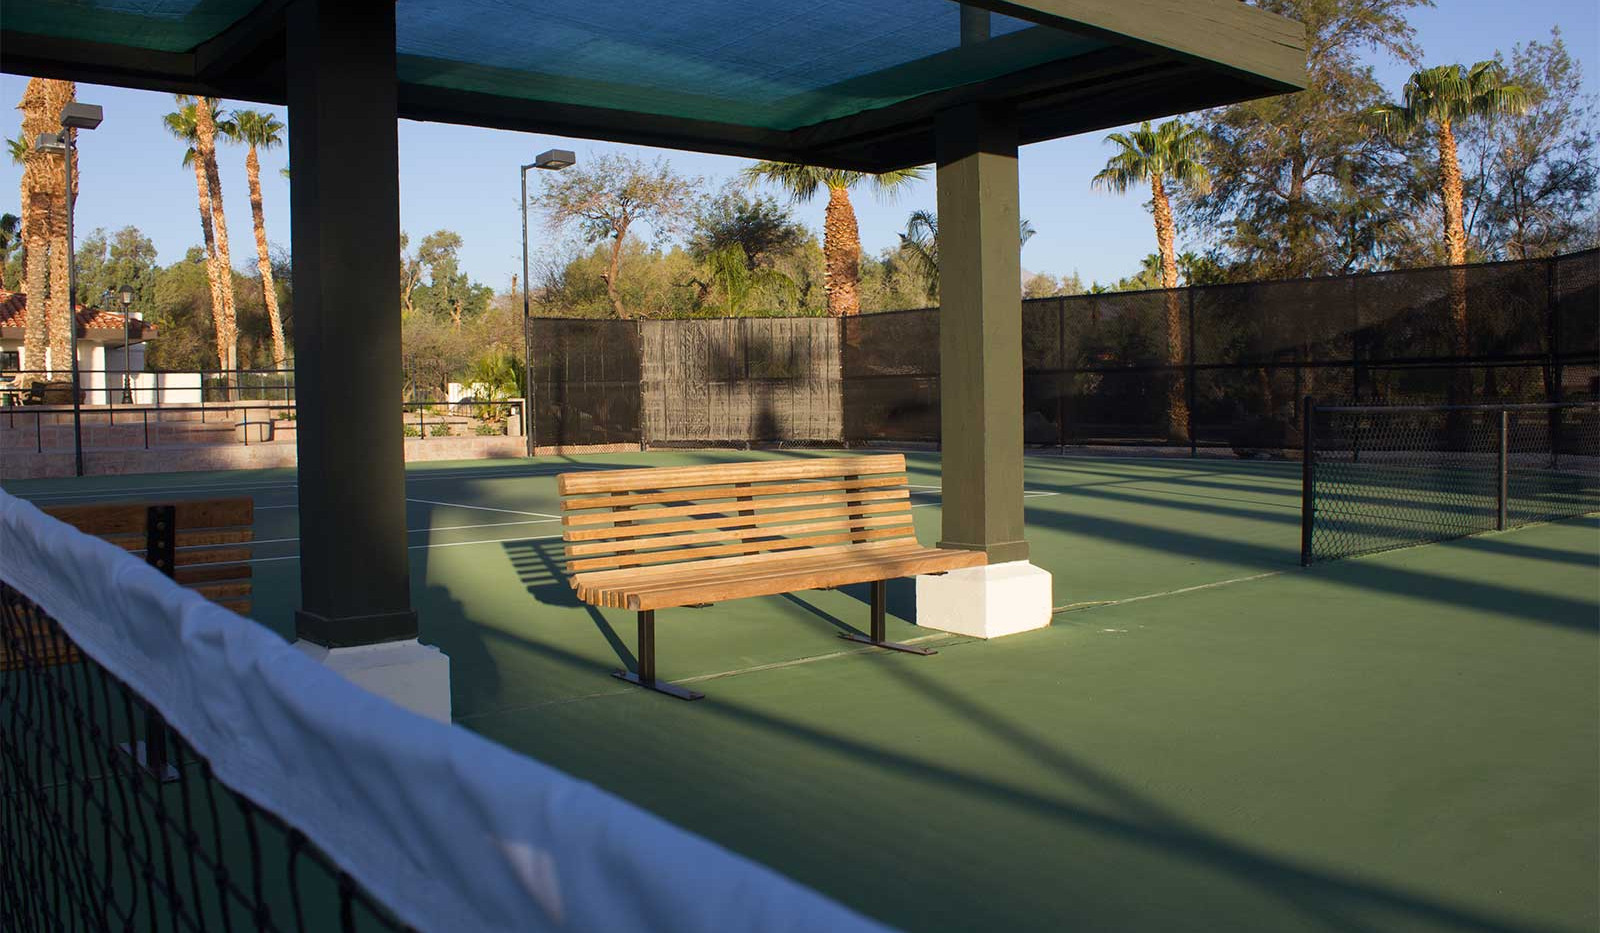 Bench at Tennis Court